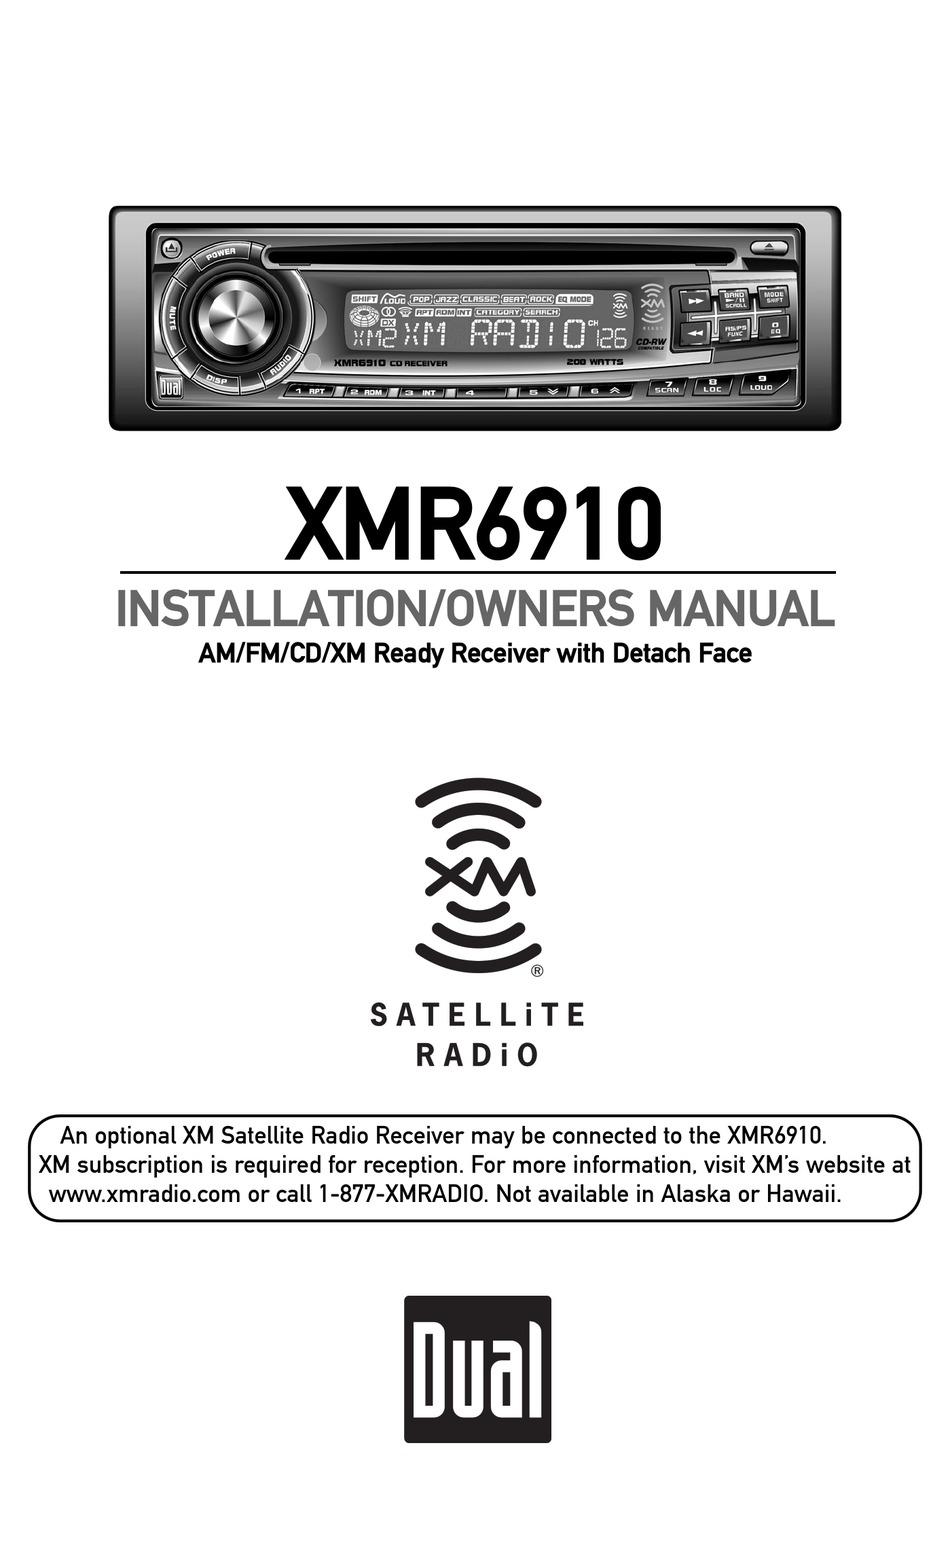 Xm Satellite Radio Xmr6910 Installation